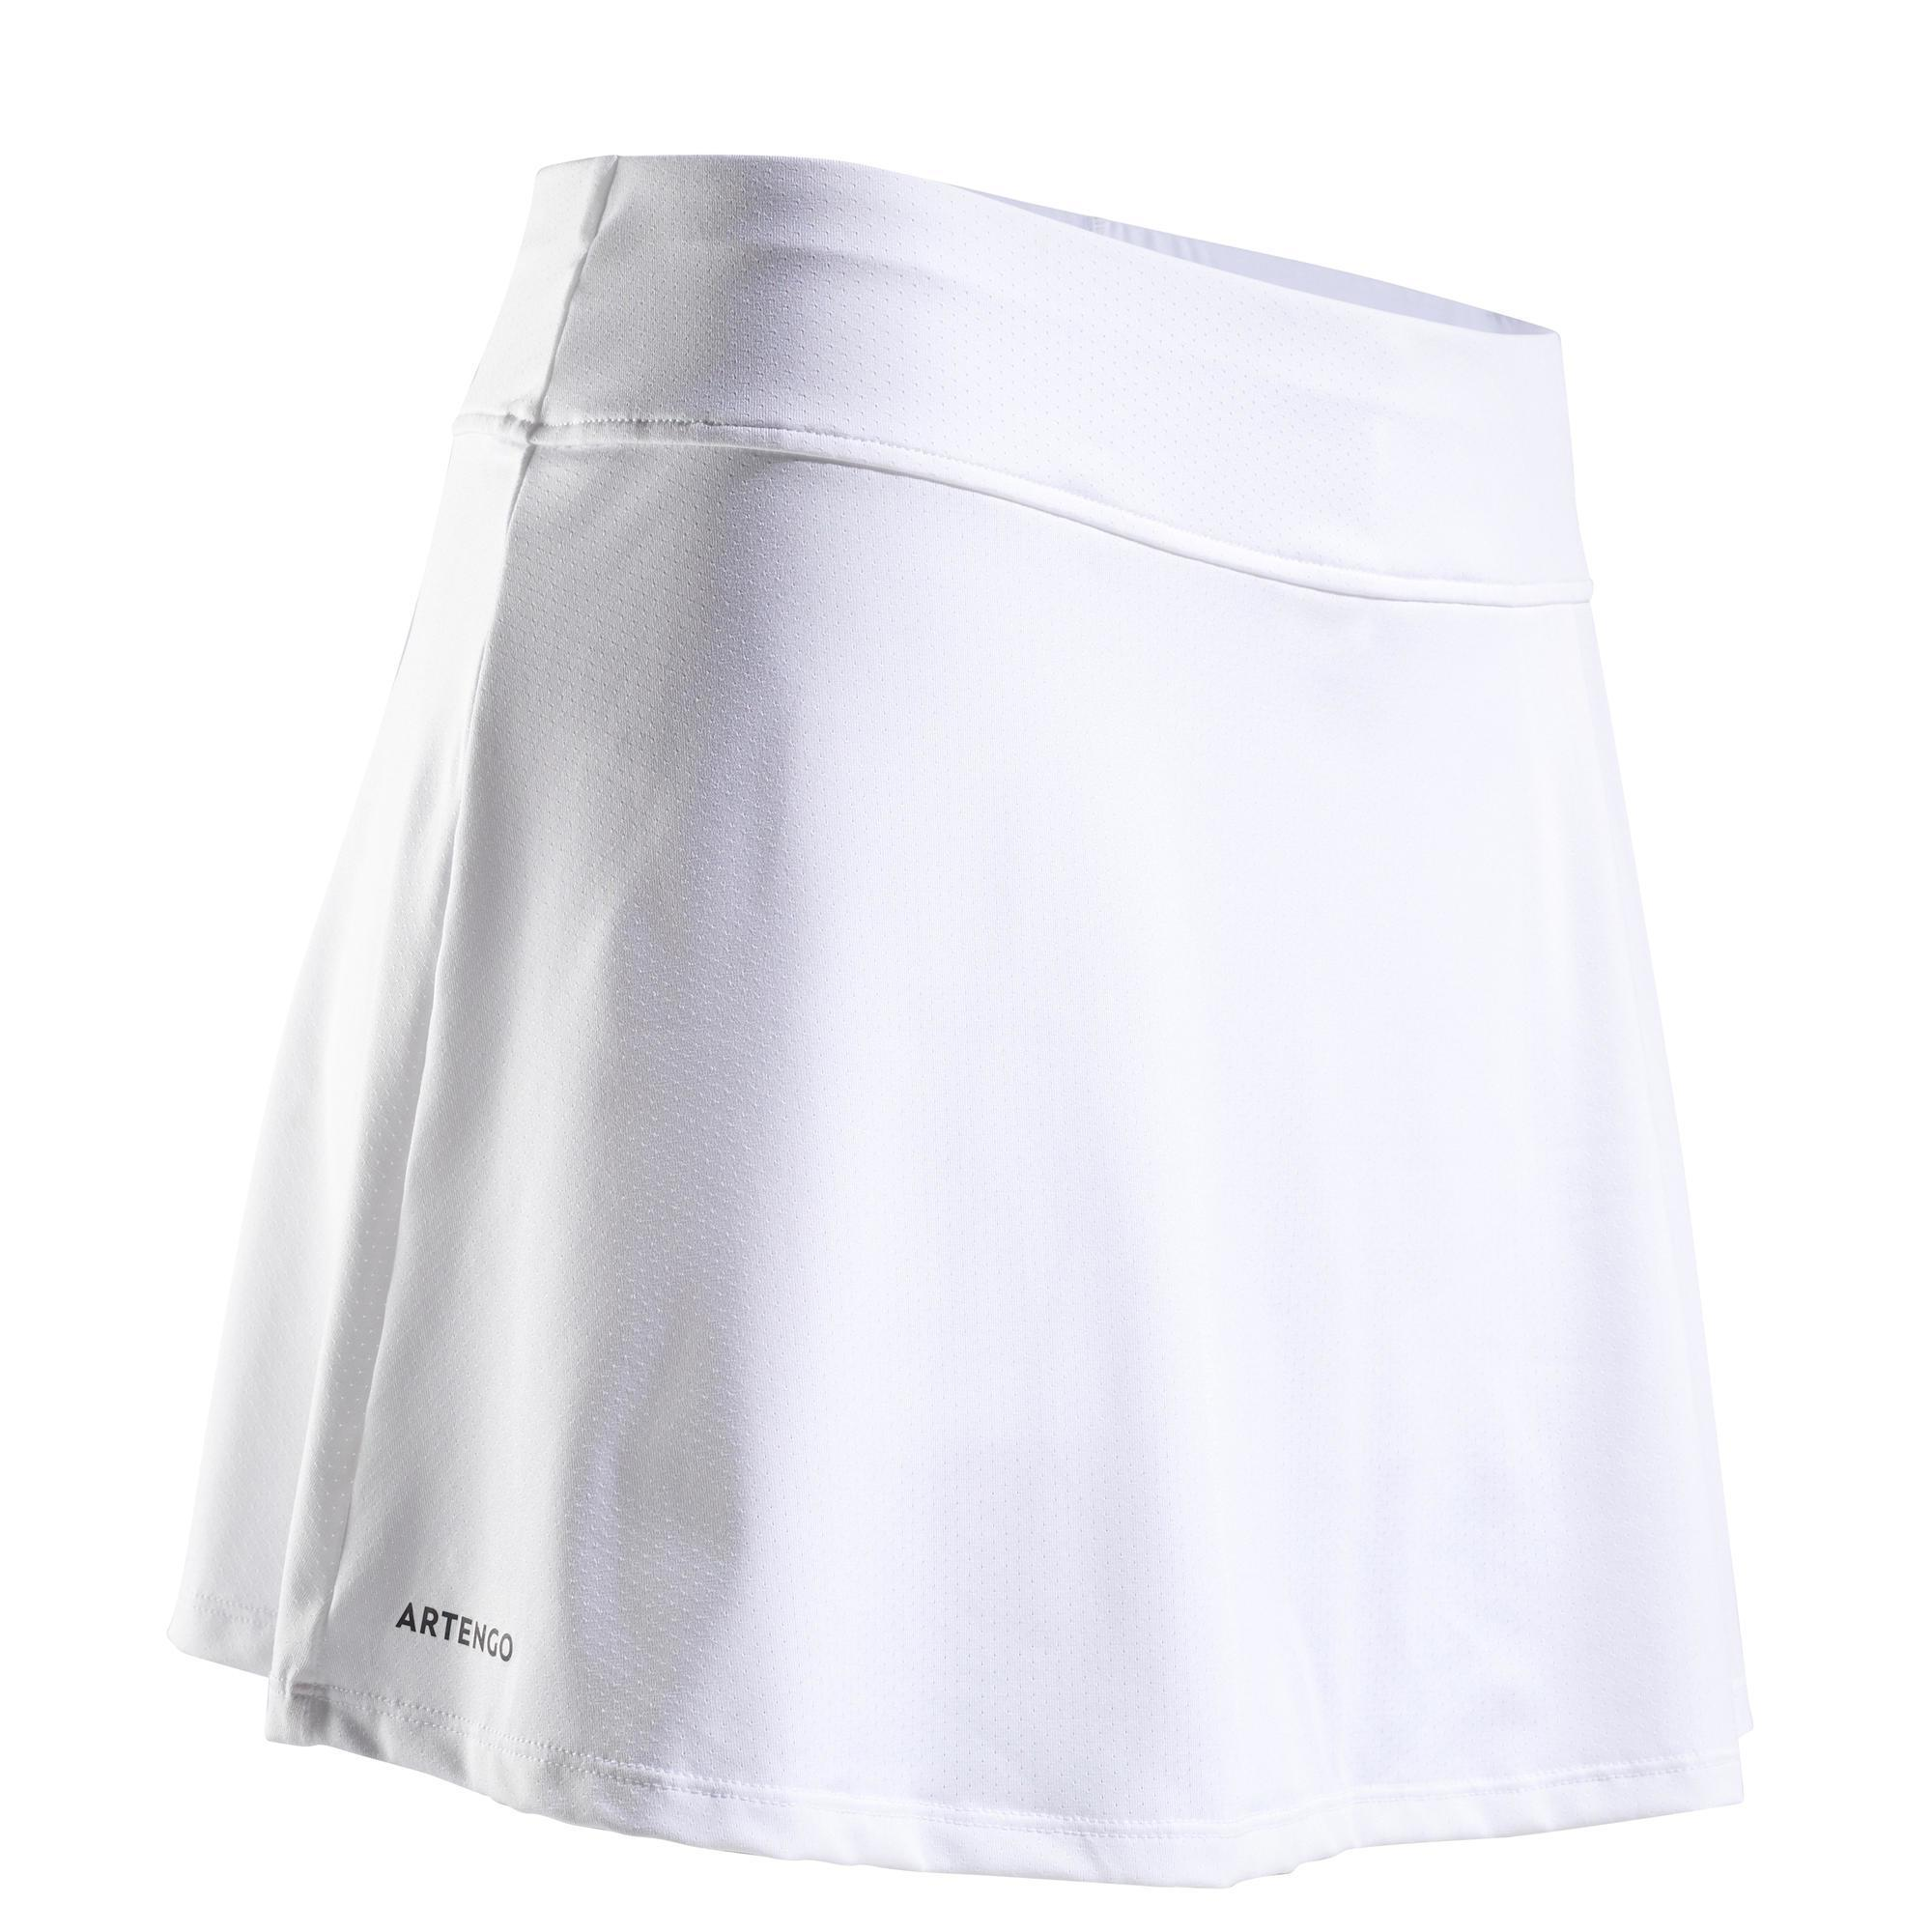 Jupe de tennis femme sk soft 500 blanche artengo